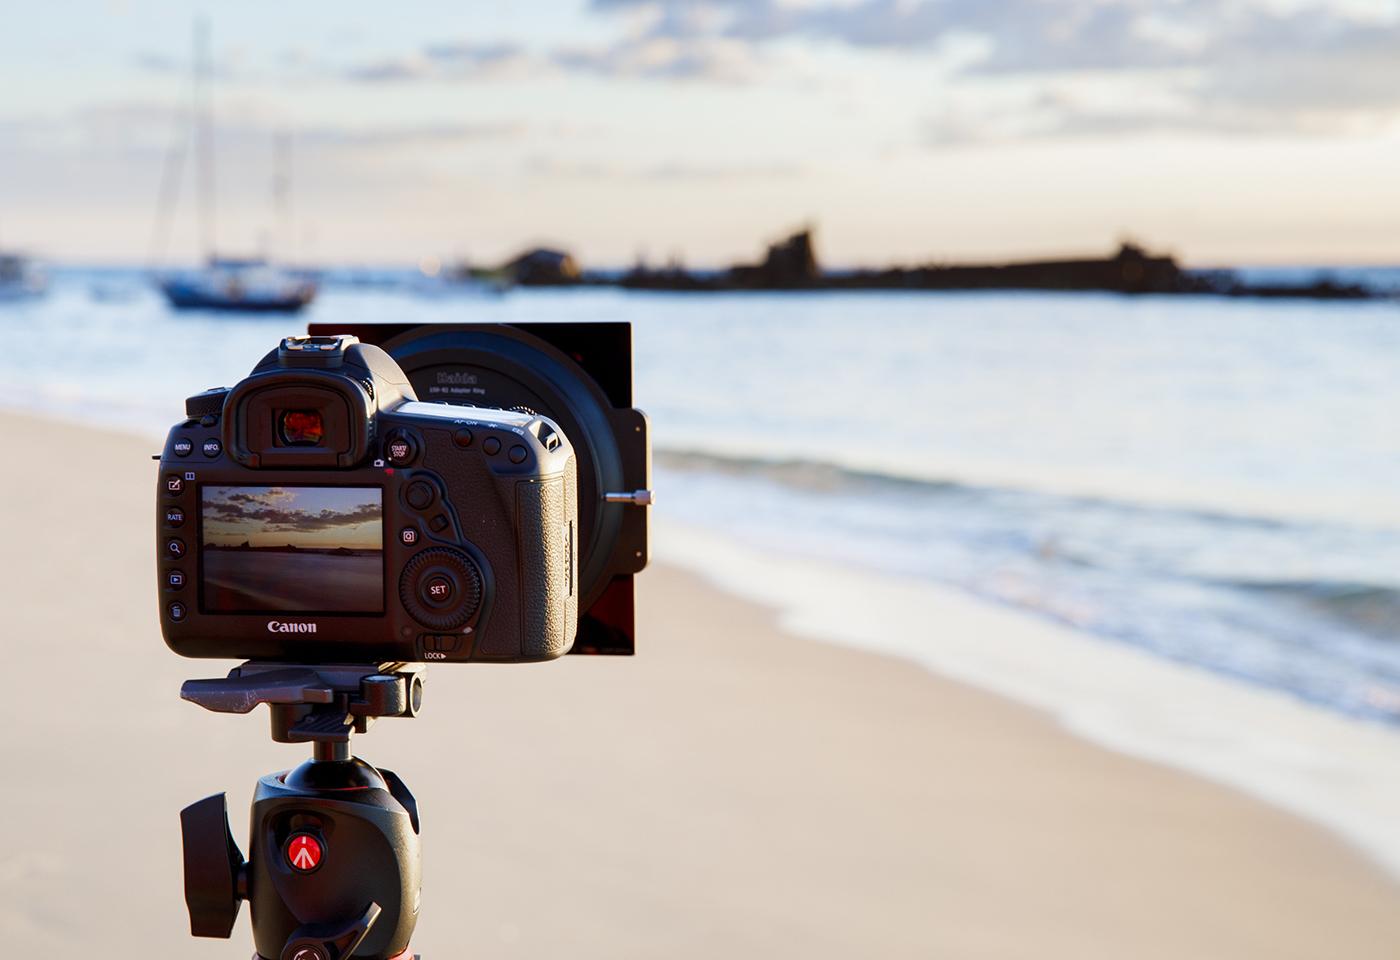 Image of camera on tripod at a beach